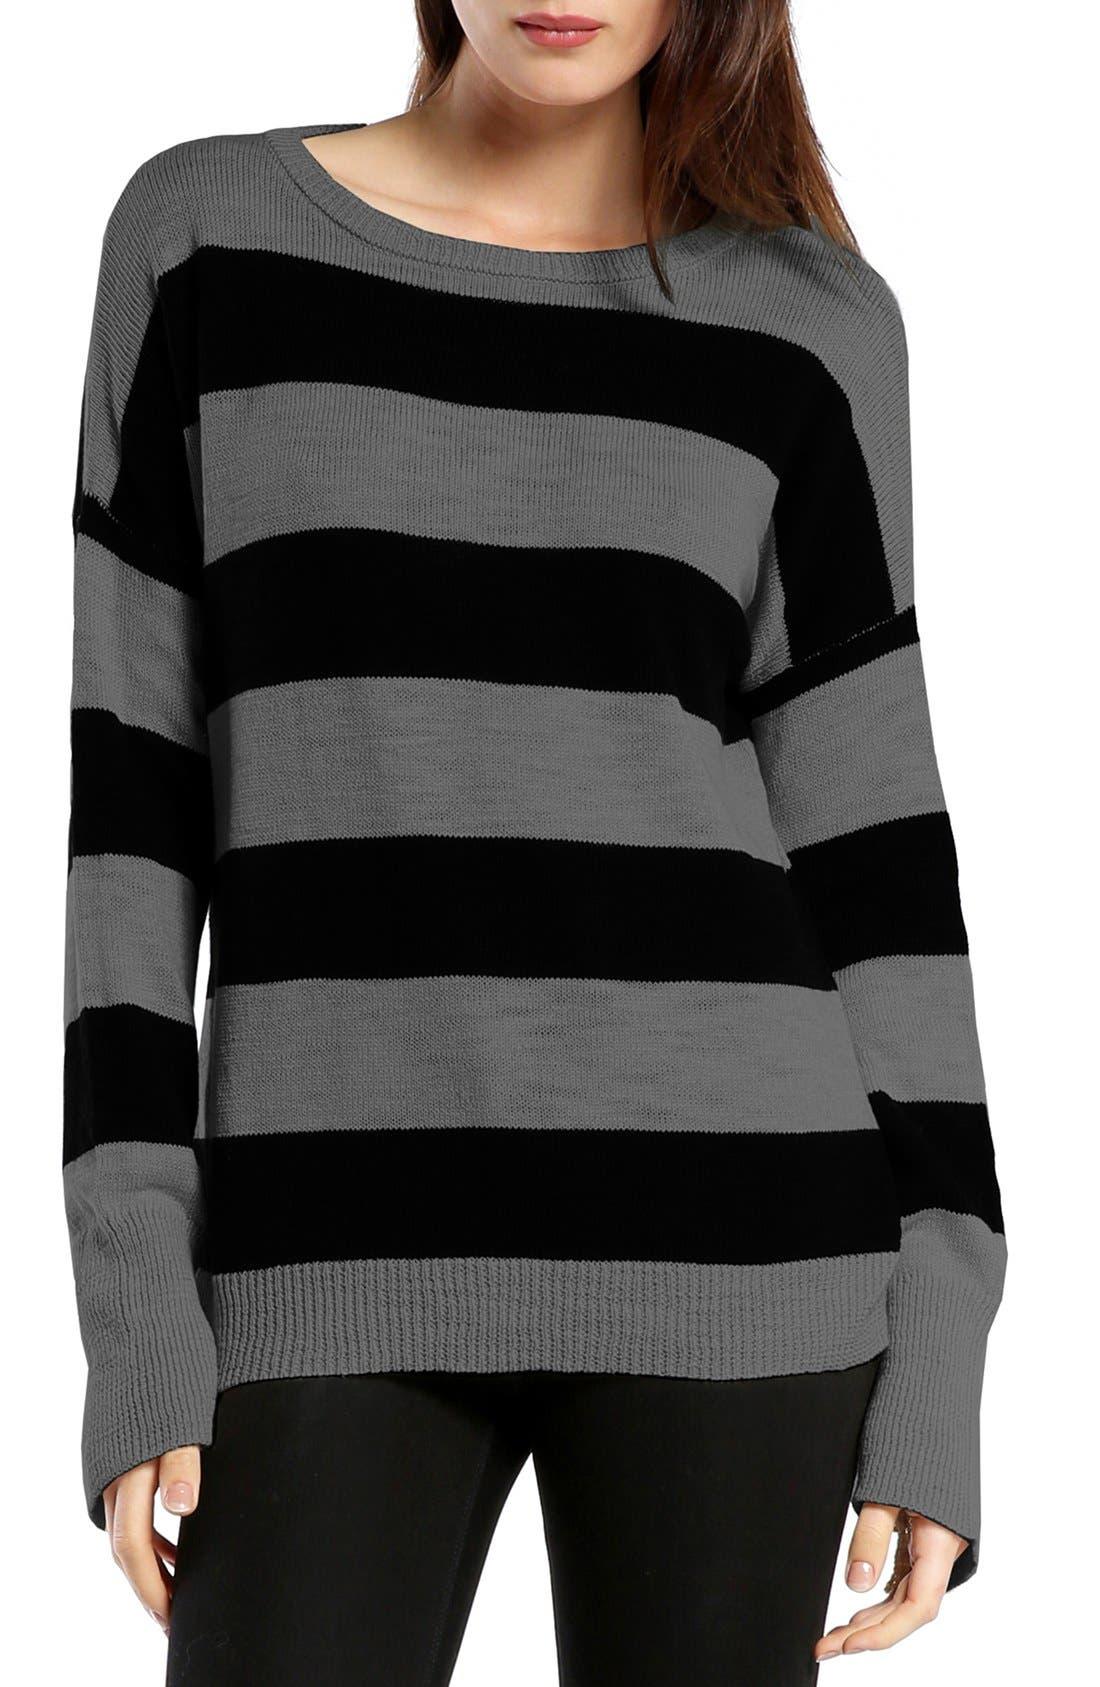 MICHAEL STARS Side Zip Stripe Boatneck Top, Main, color, 055